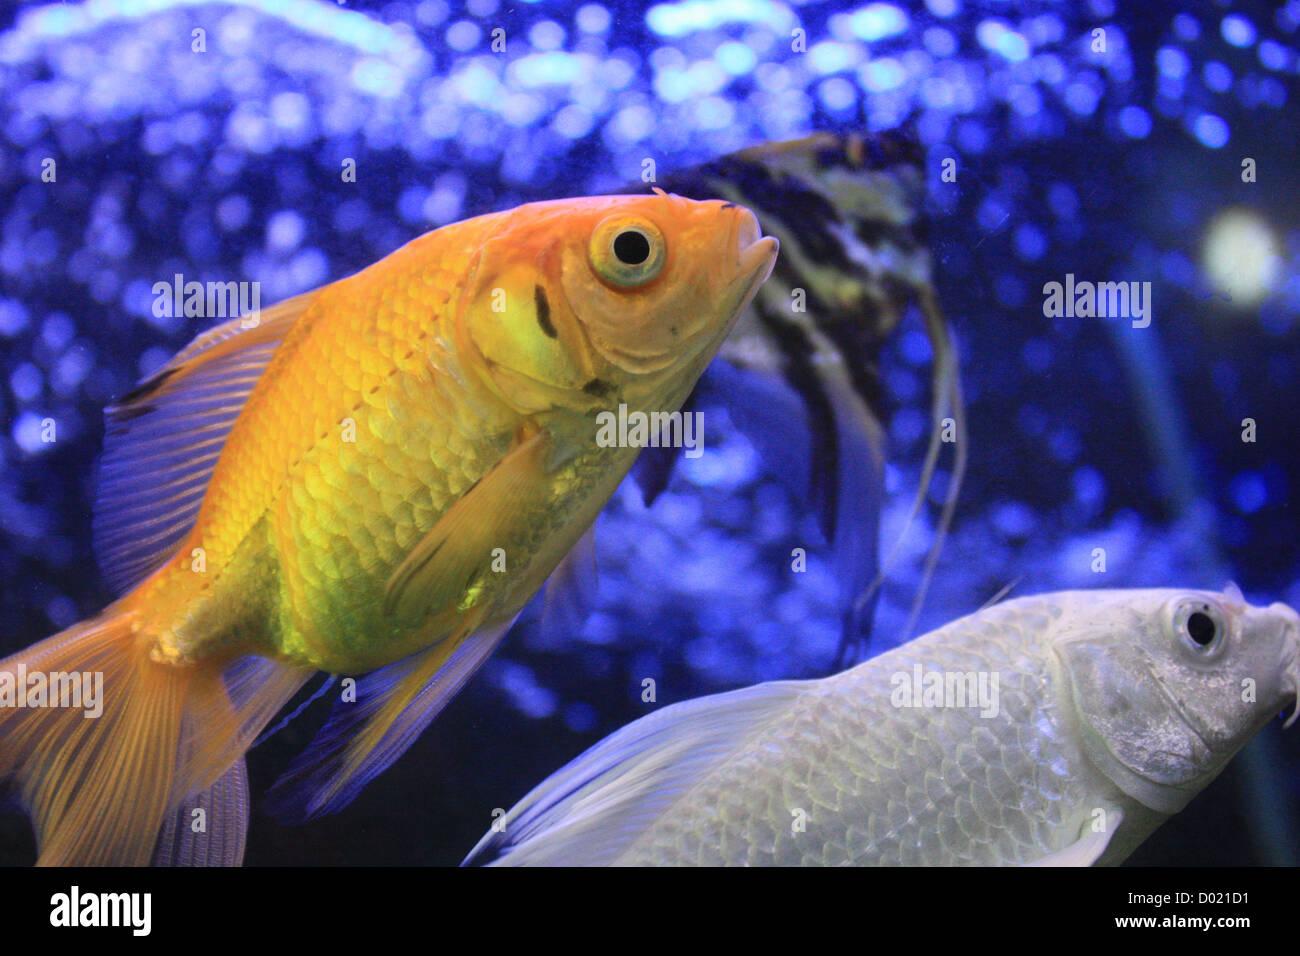 freshwater fish, aquarium fish, tropical fish, pictures of